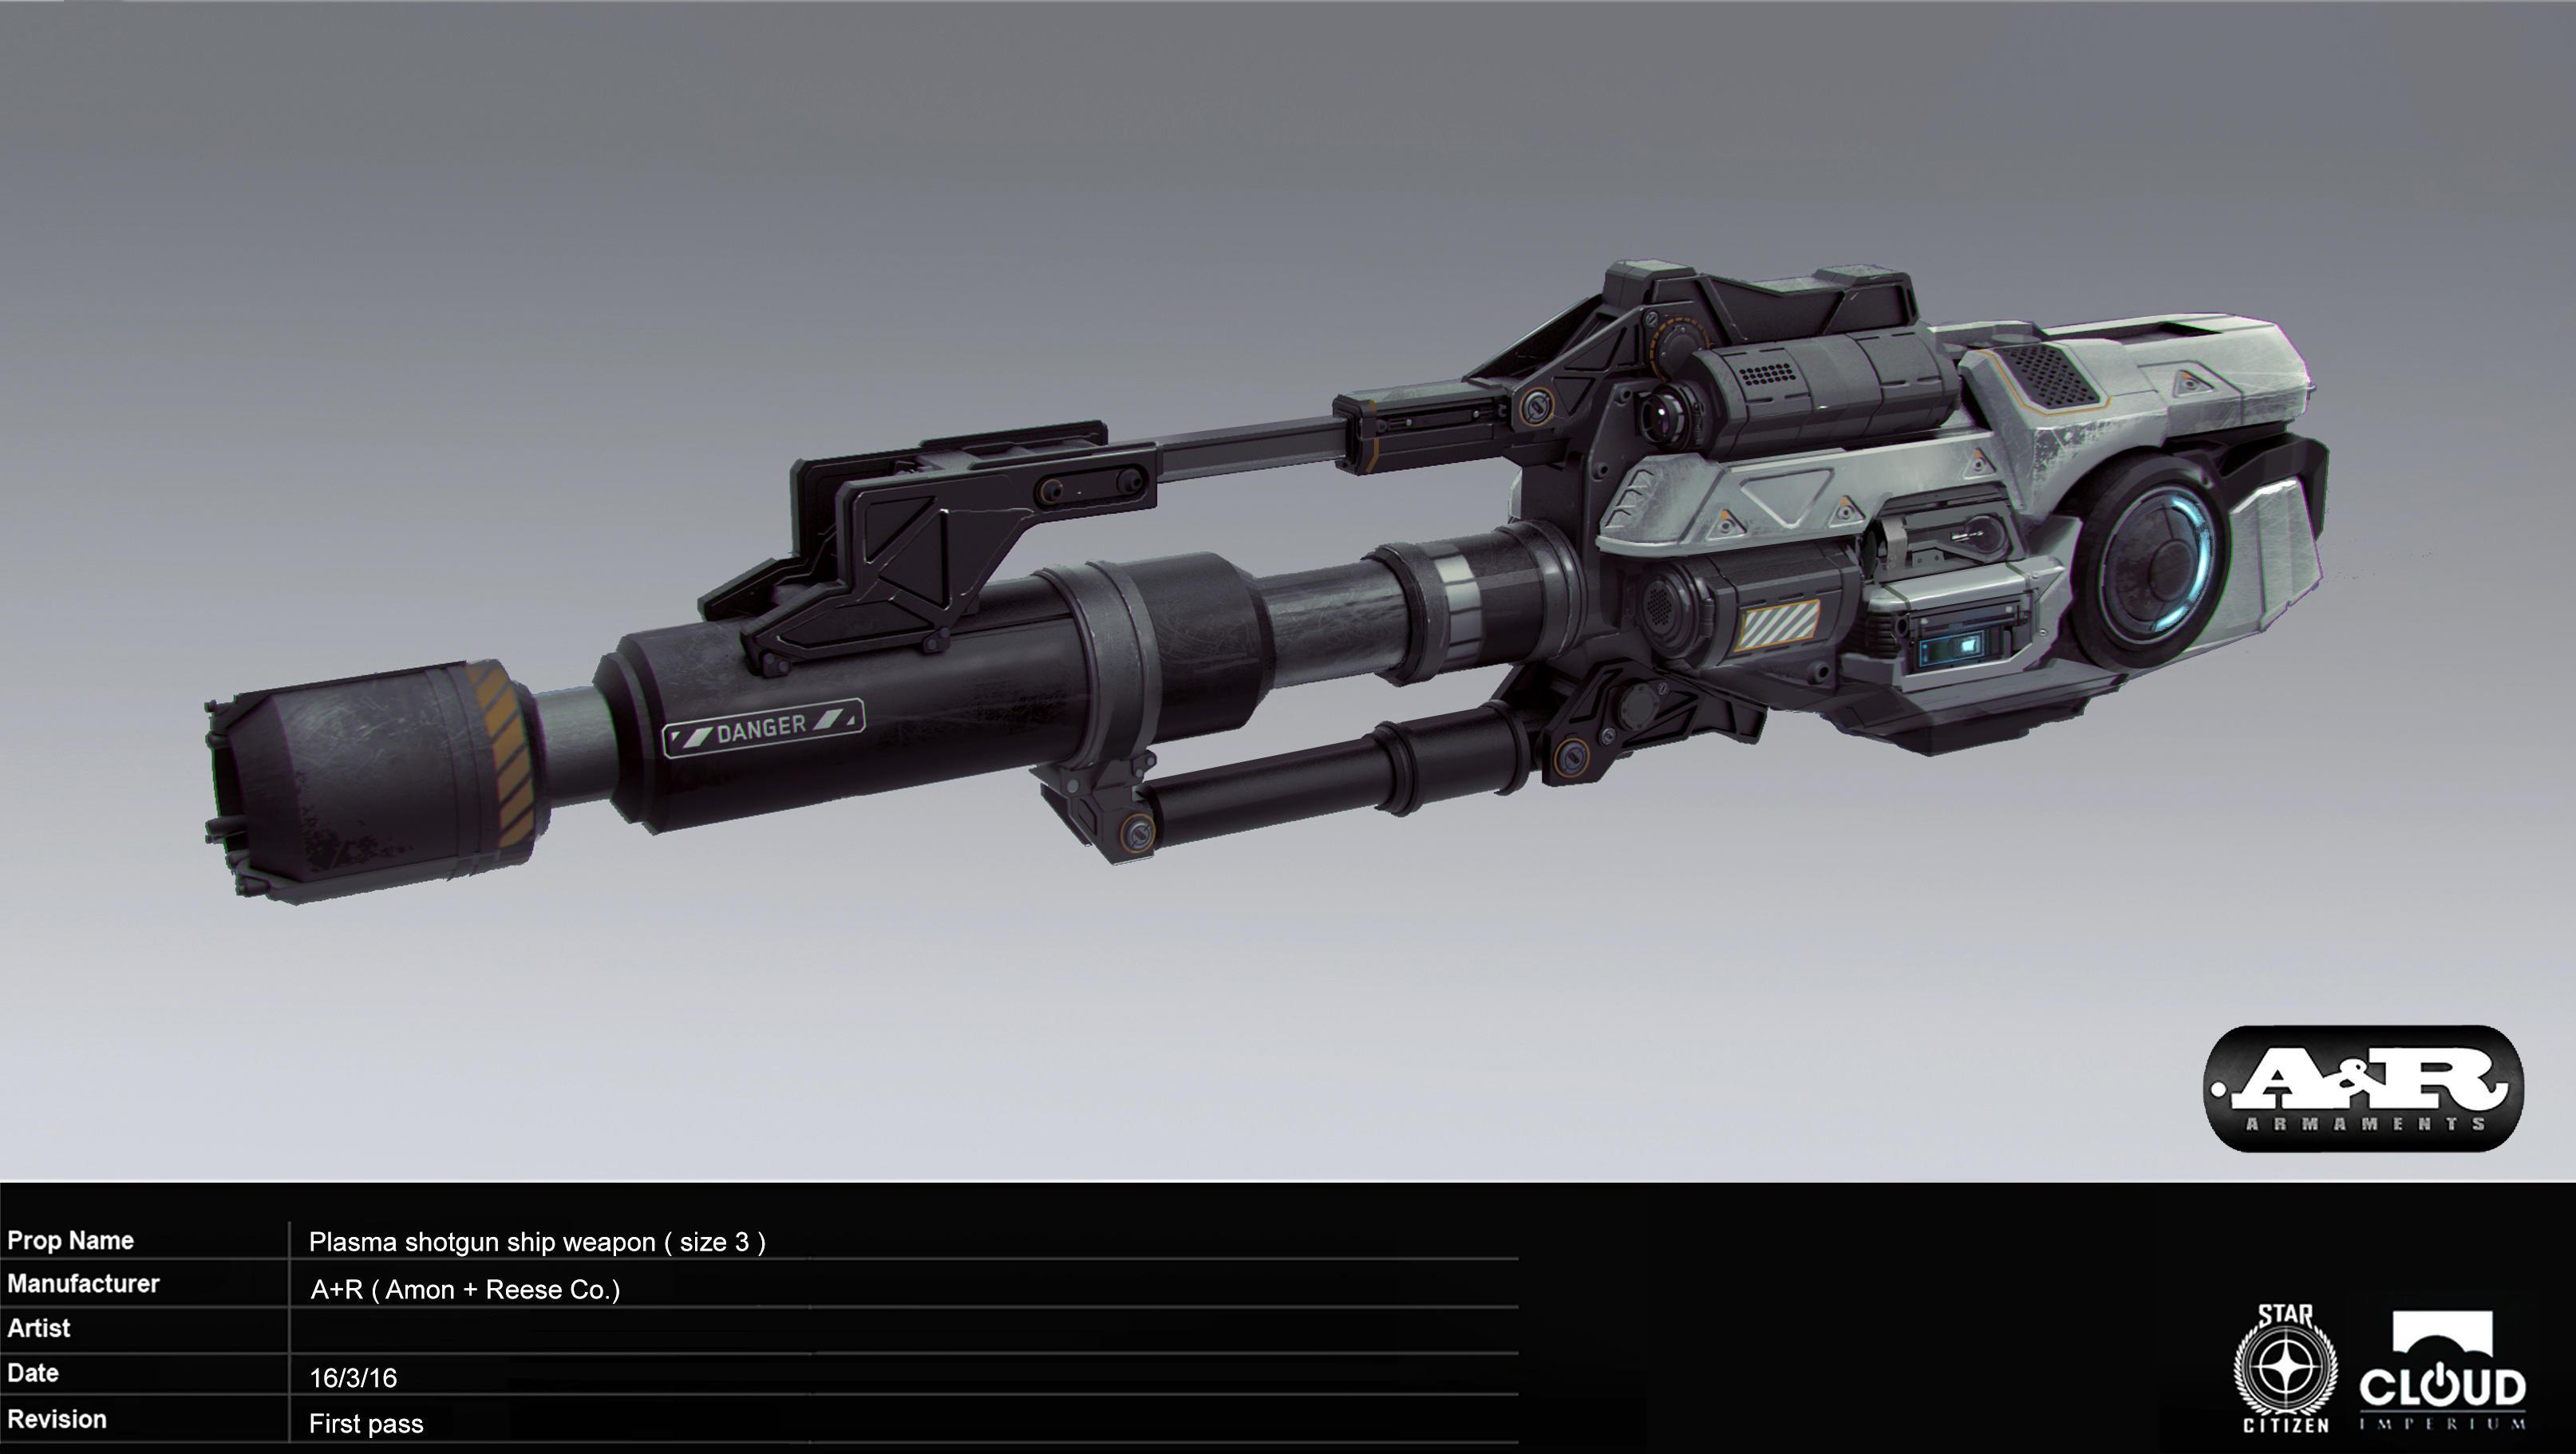 Plasma shotgun ship weapon (size 3)